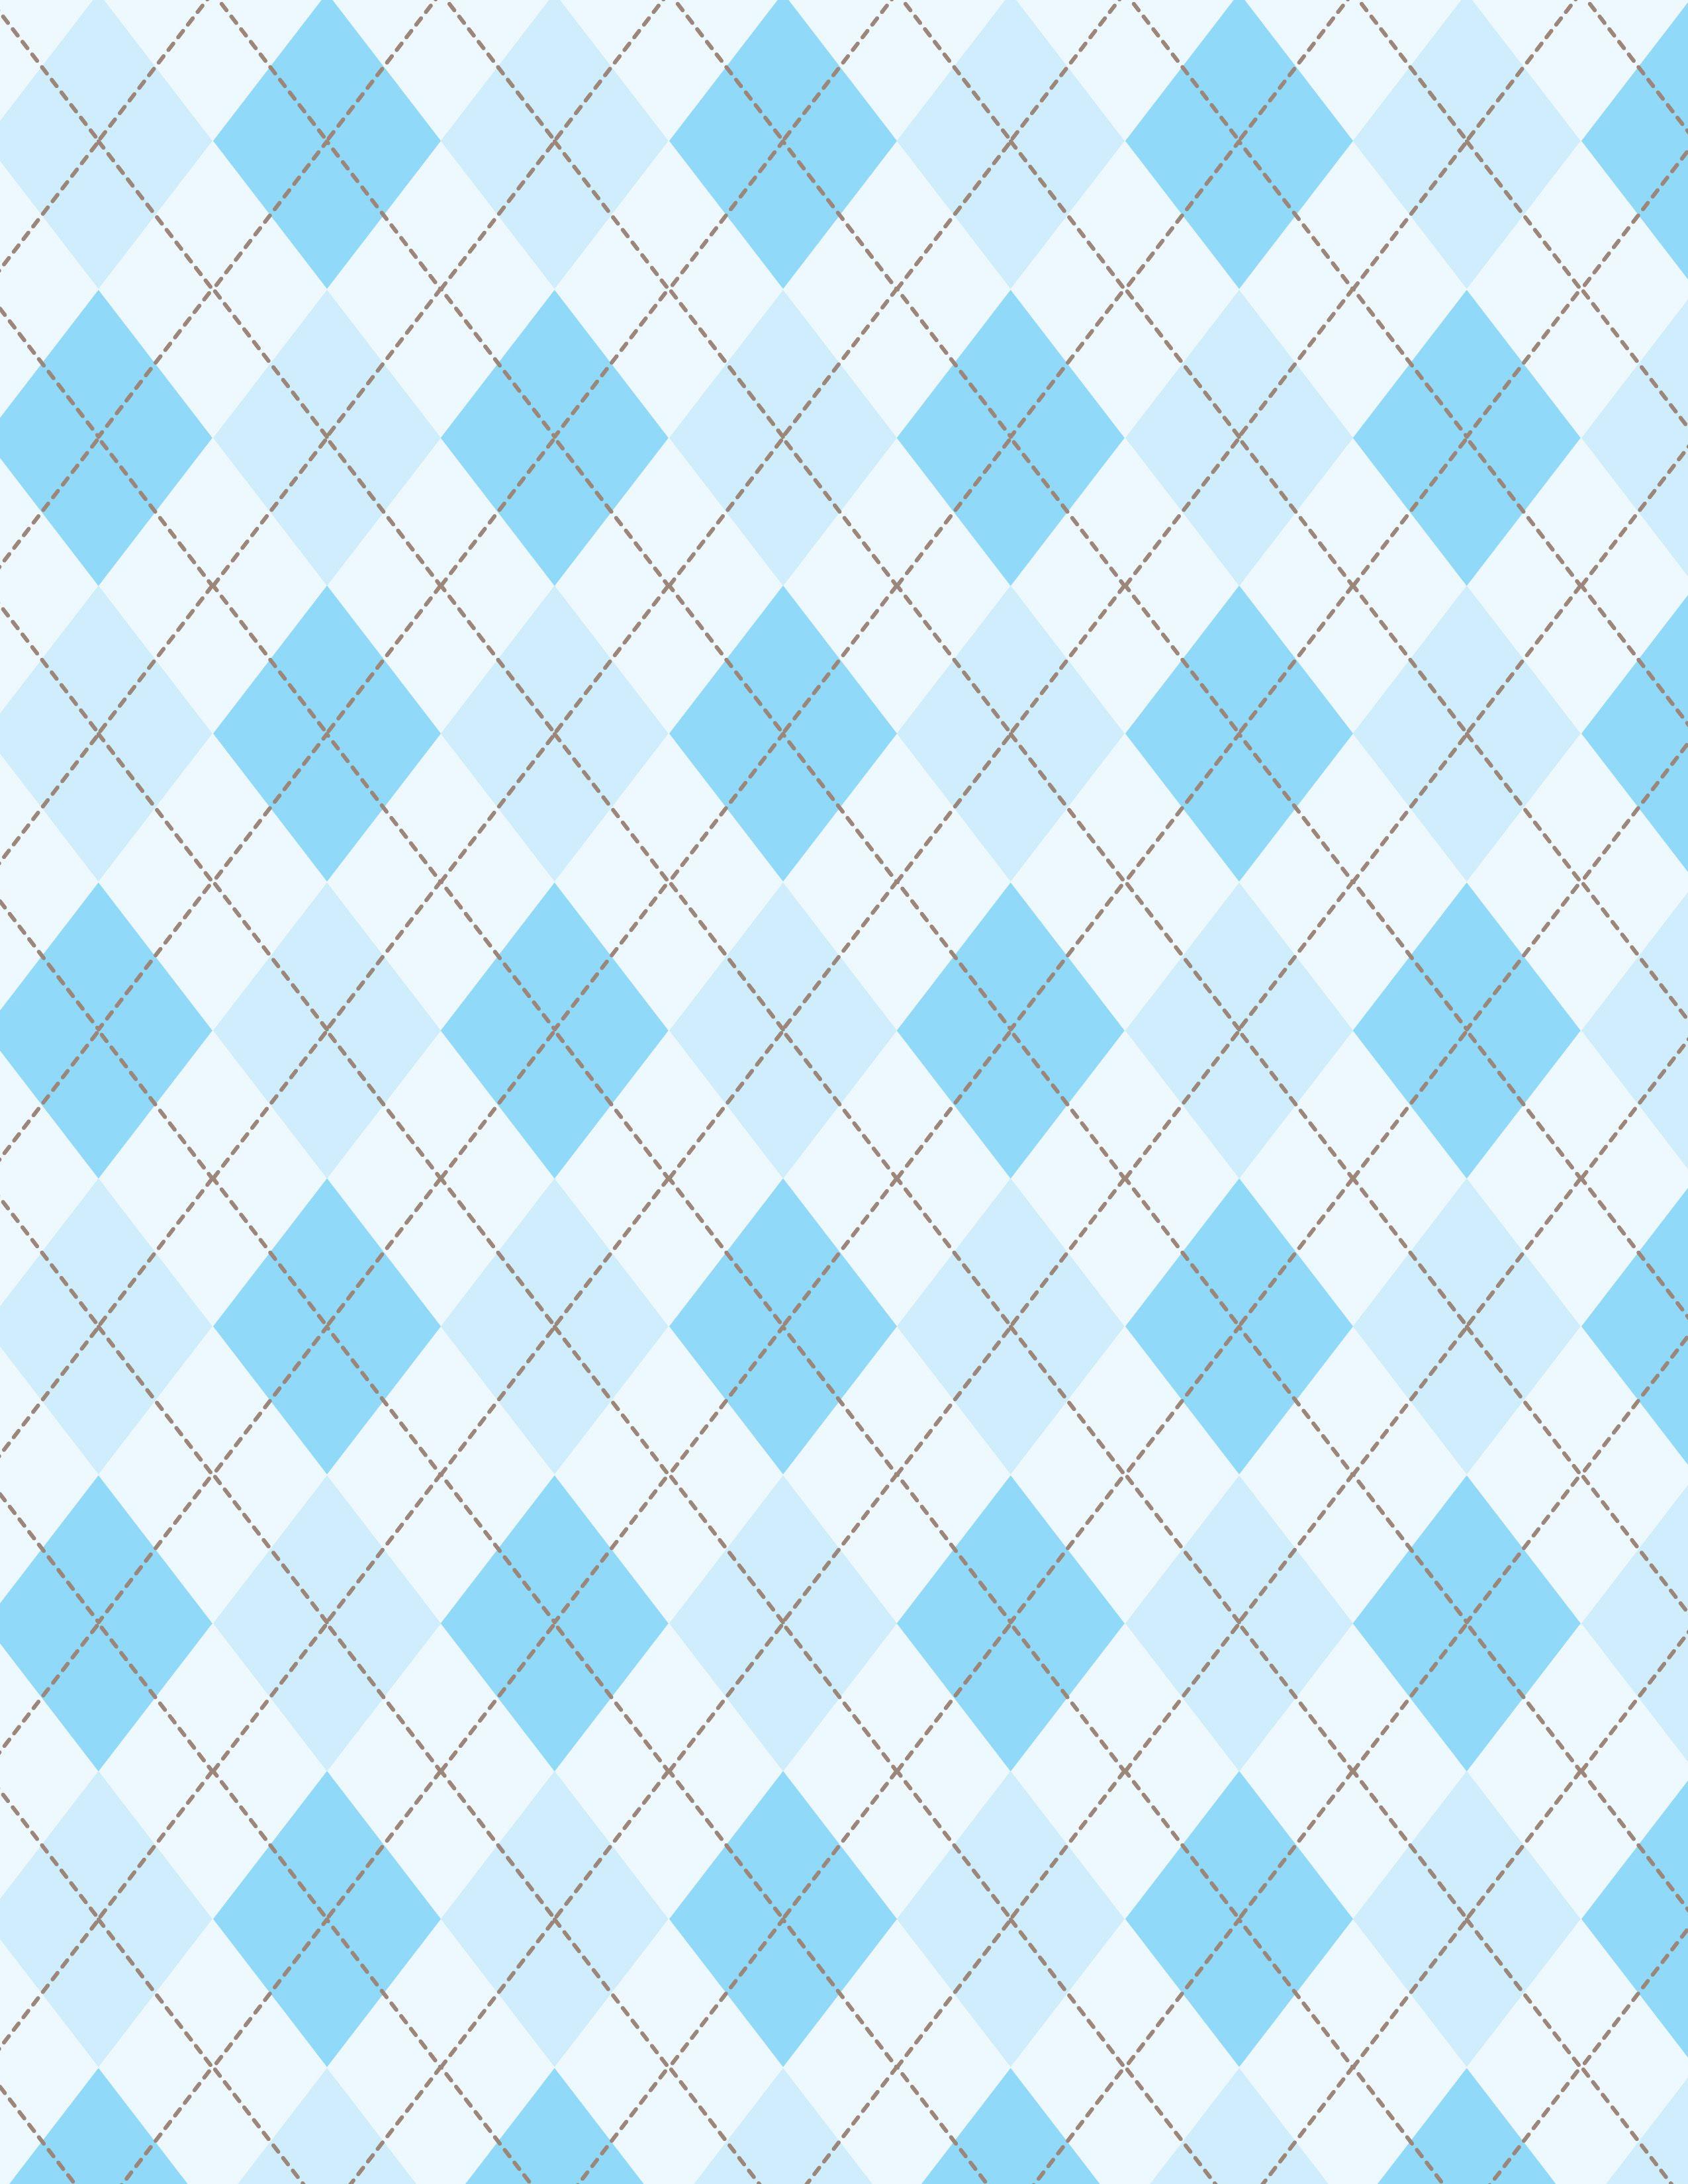 Rombos En Azul Y Blanco 2550x3300